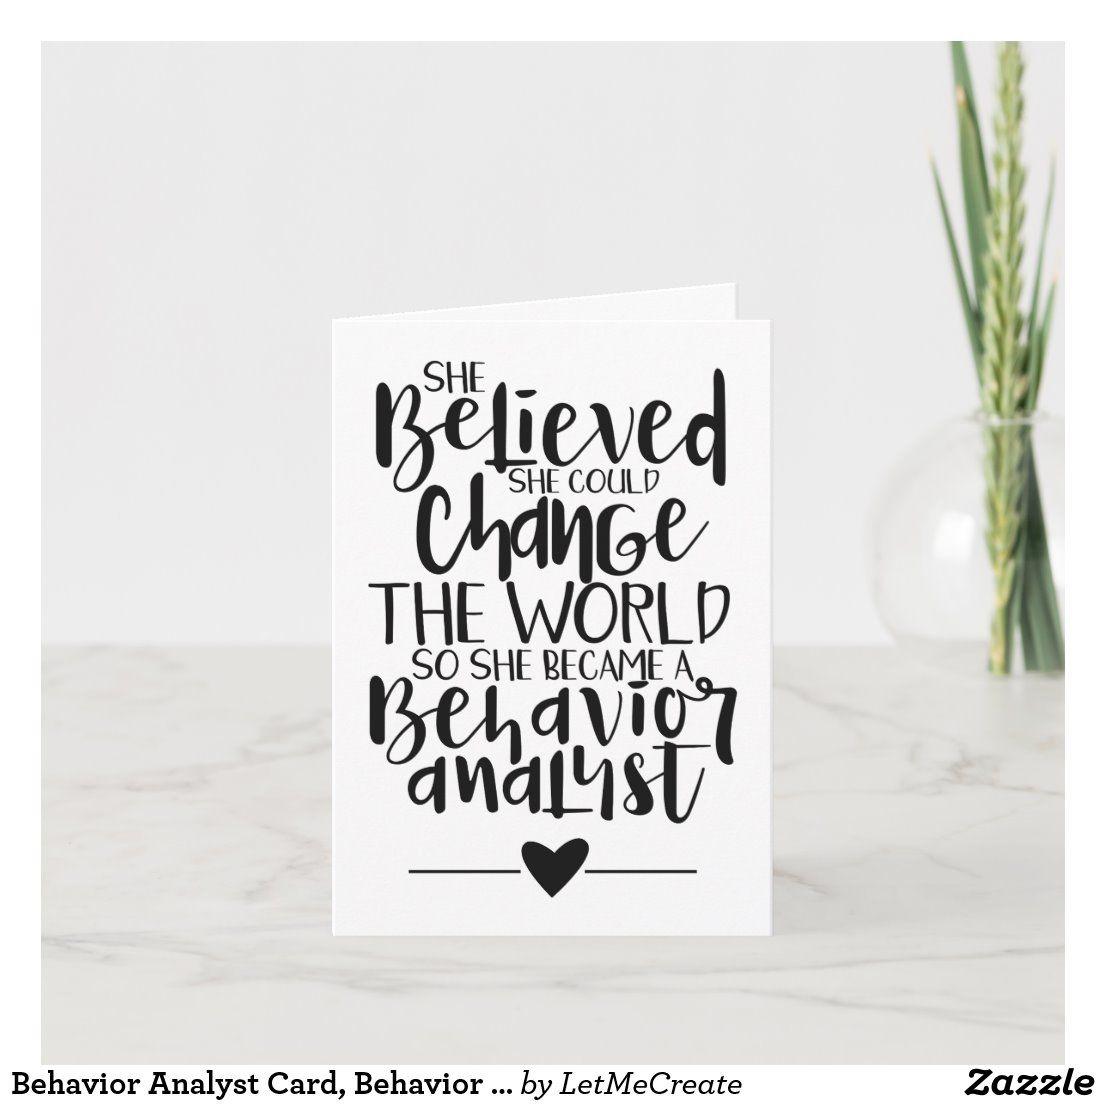 Behavior analyst card behavior analyst card